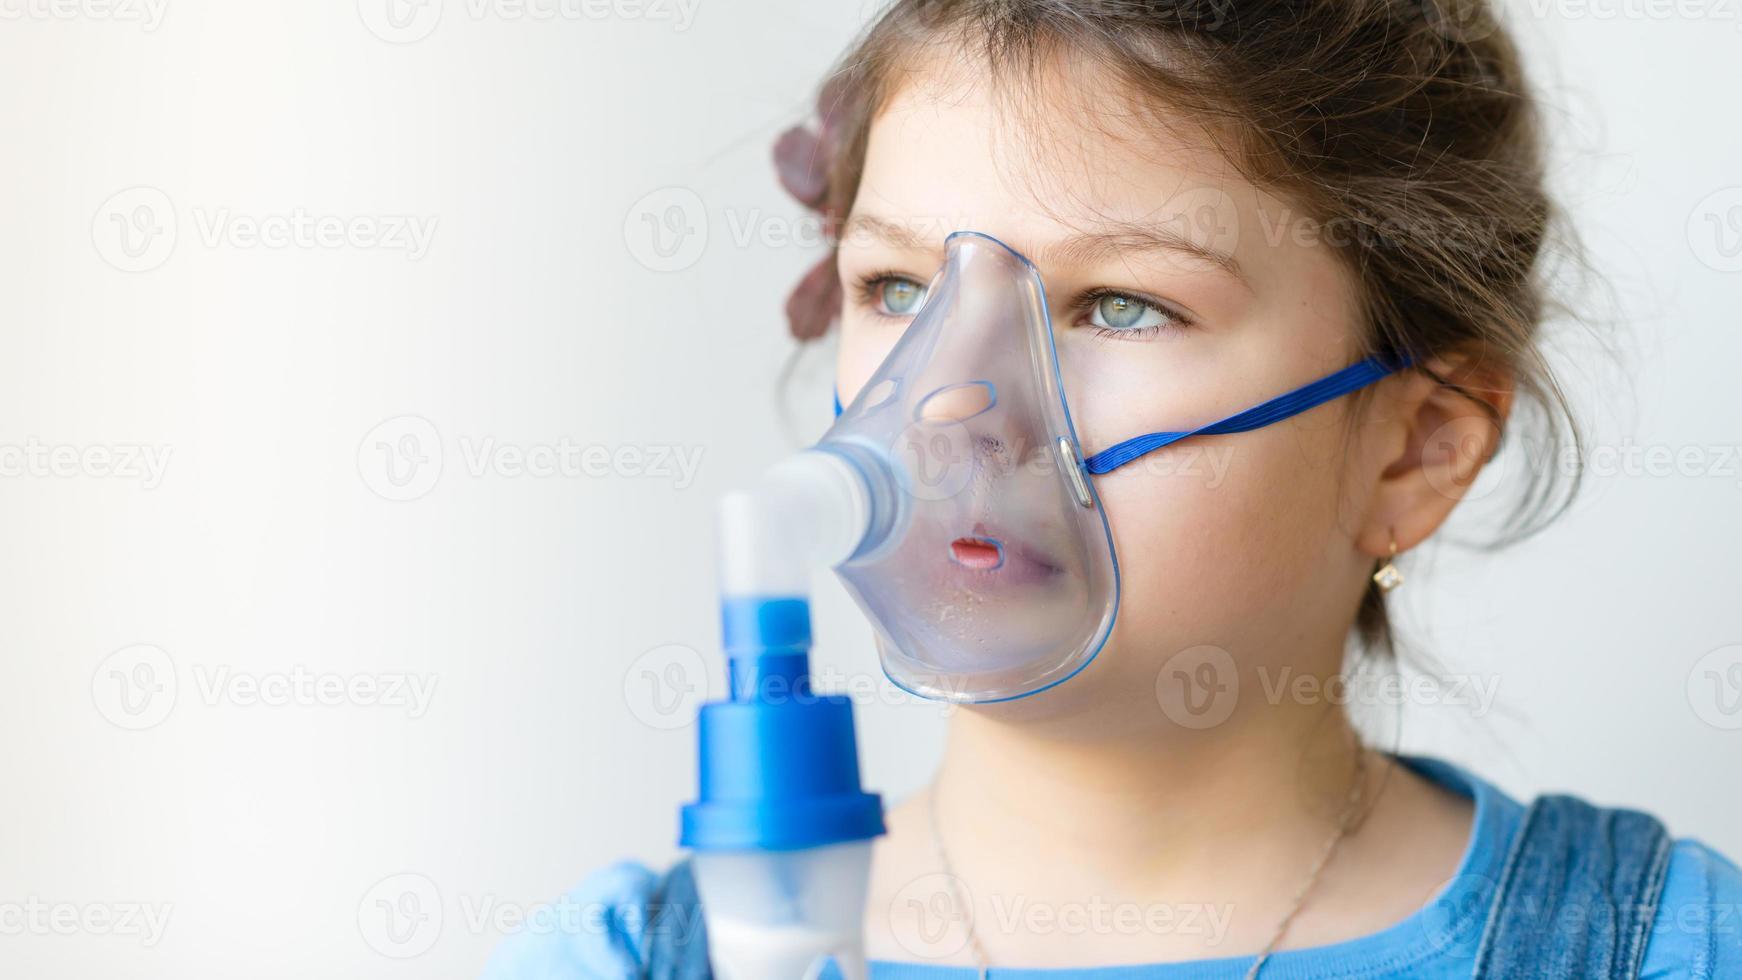 menina com inalador de asma foto